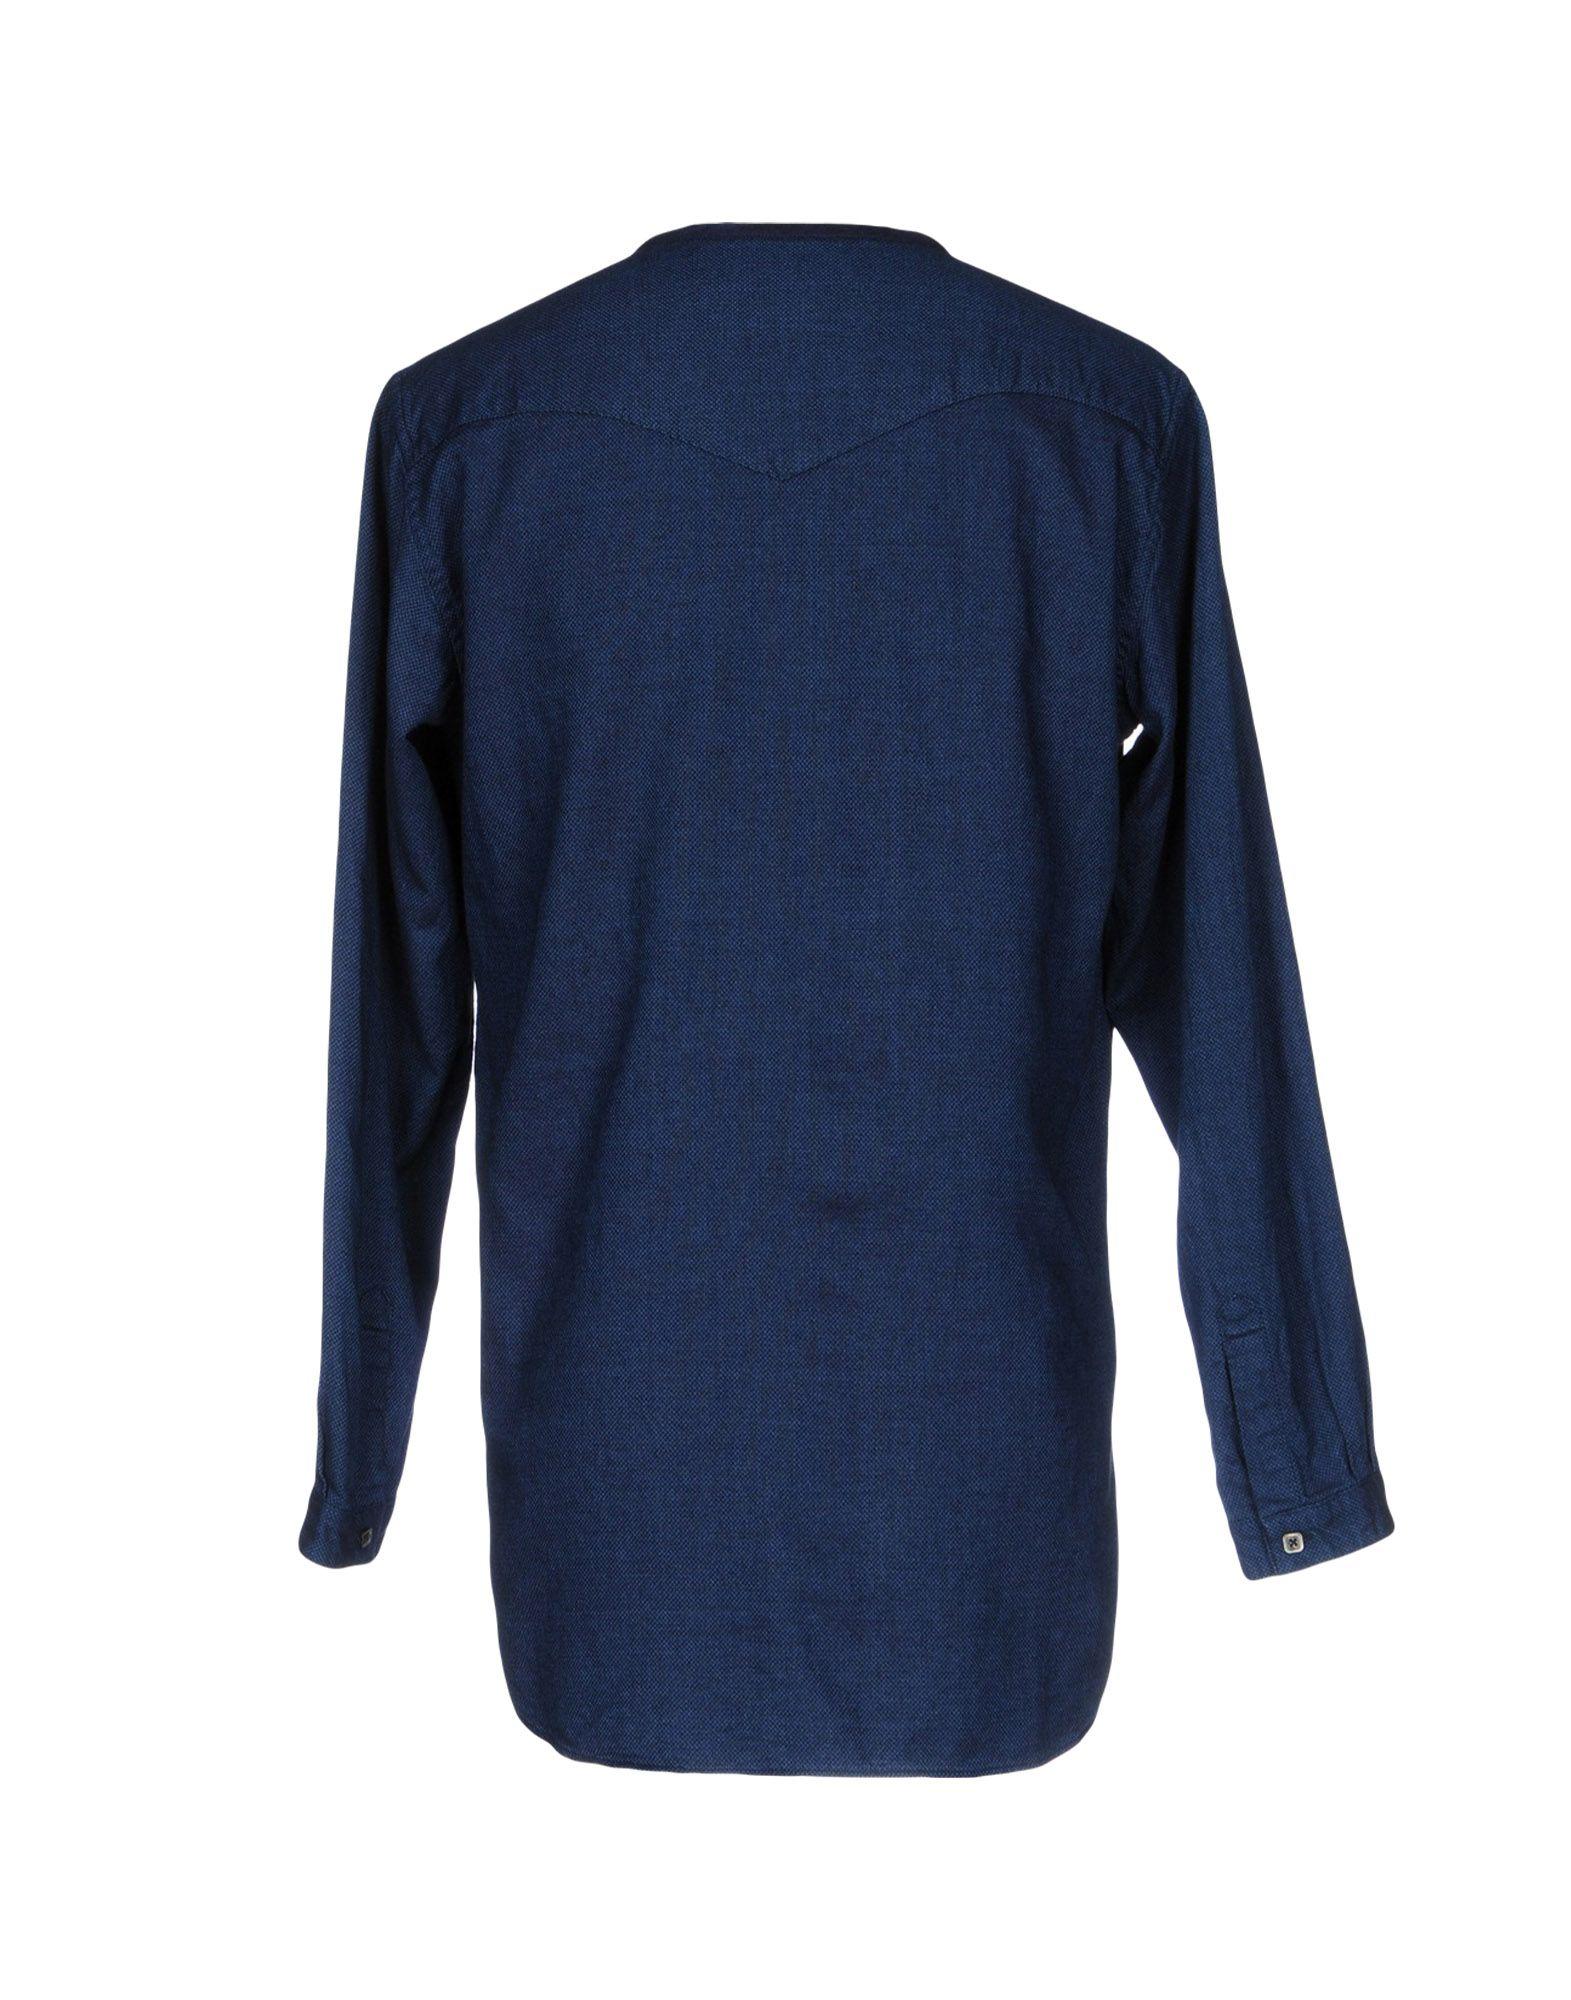 Camicia Fantasia blu blu  - Japan Uomo -  38664461EV b8995e